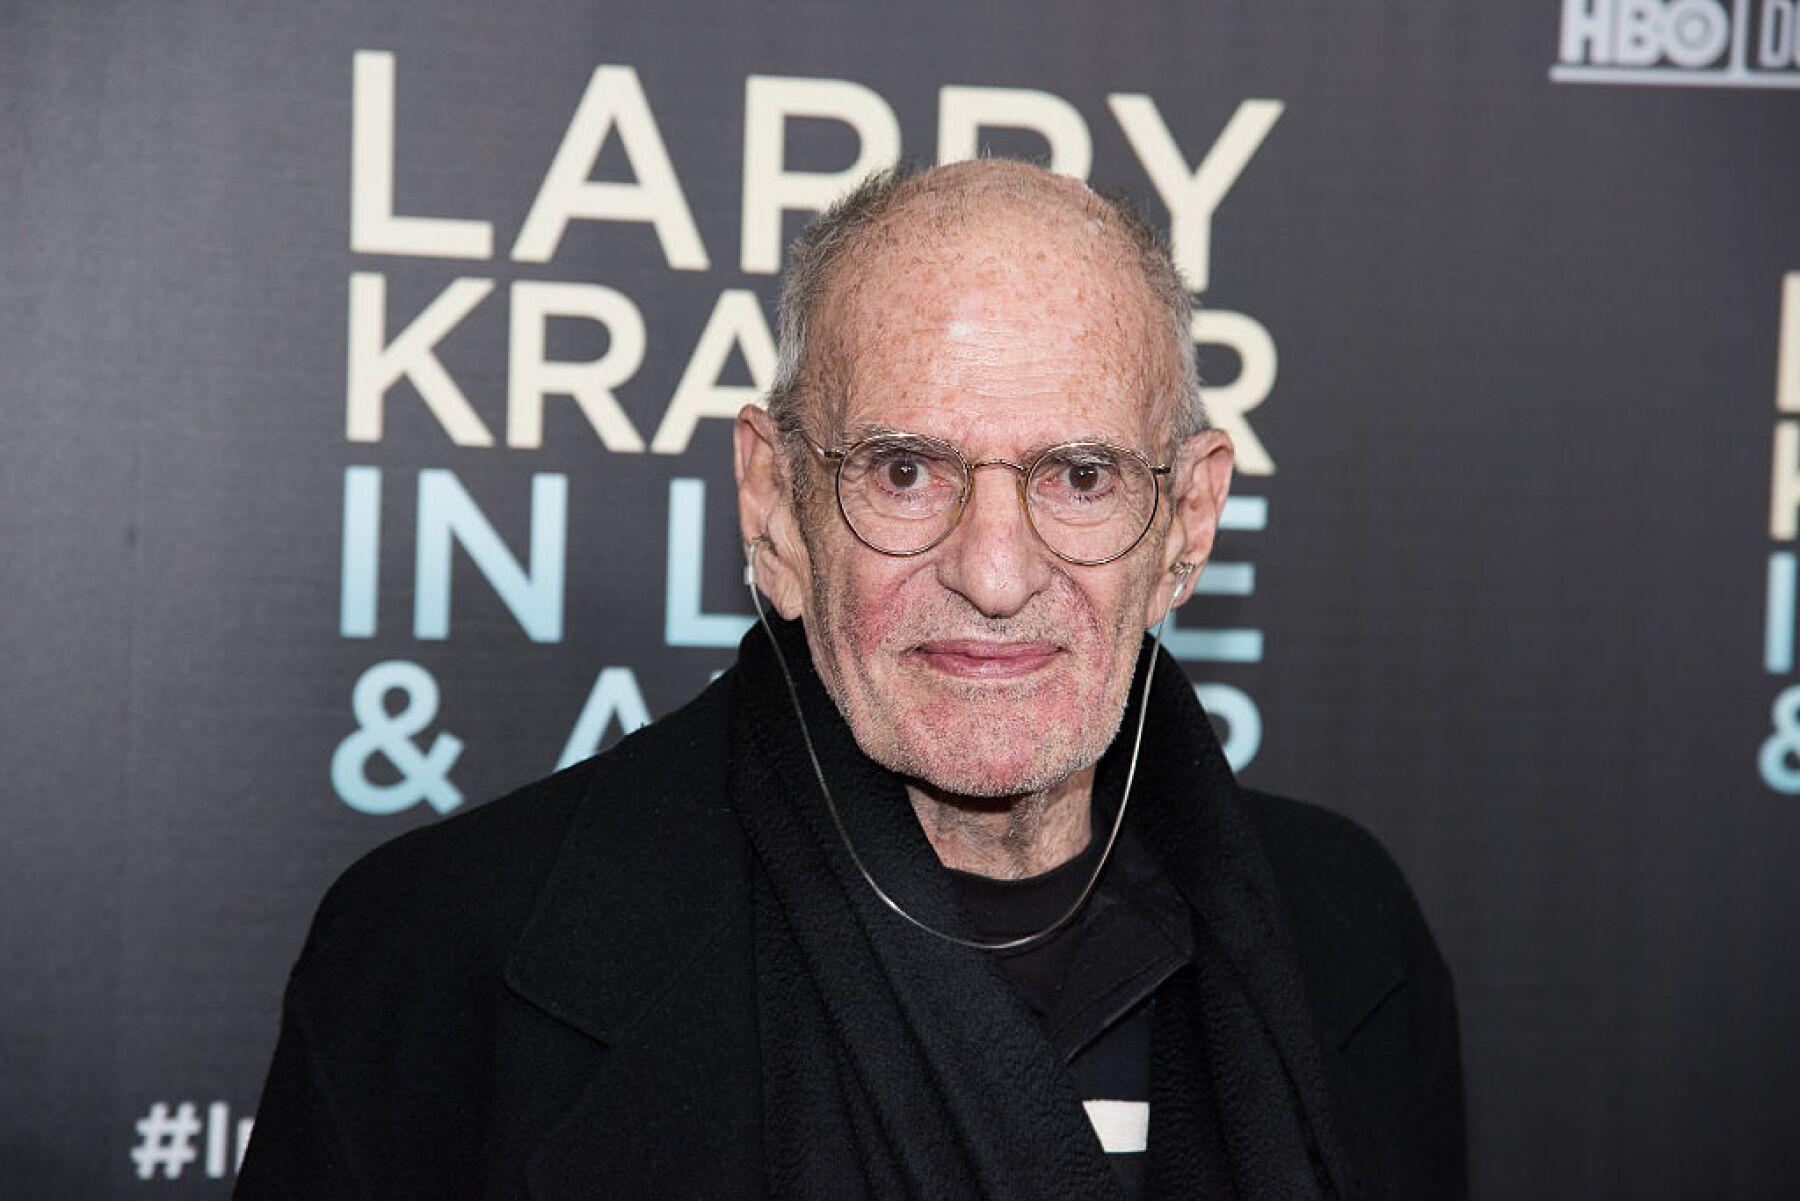 """Larry Kramer In Love And Anger"" New York Premiere"